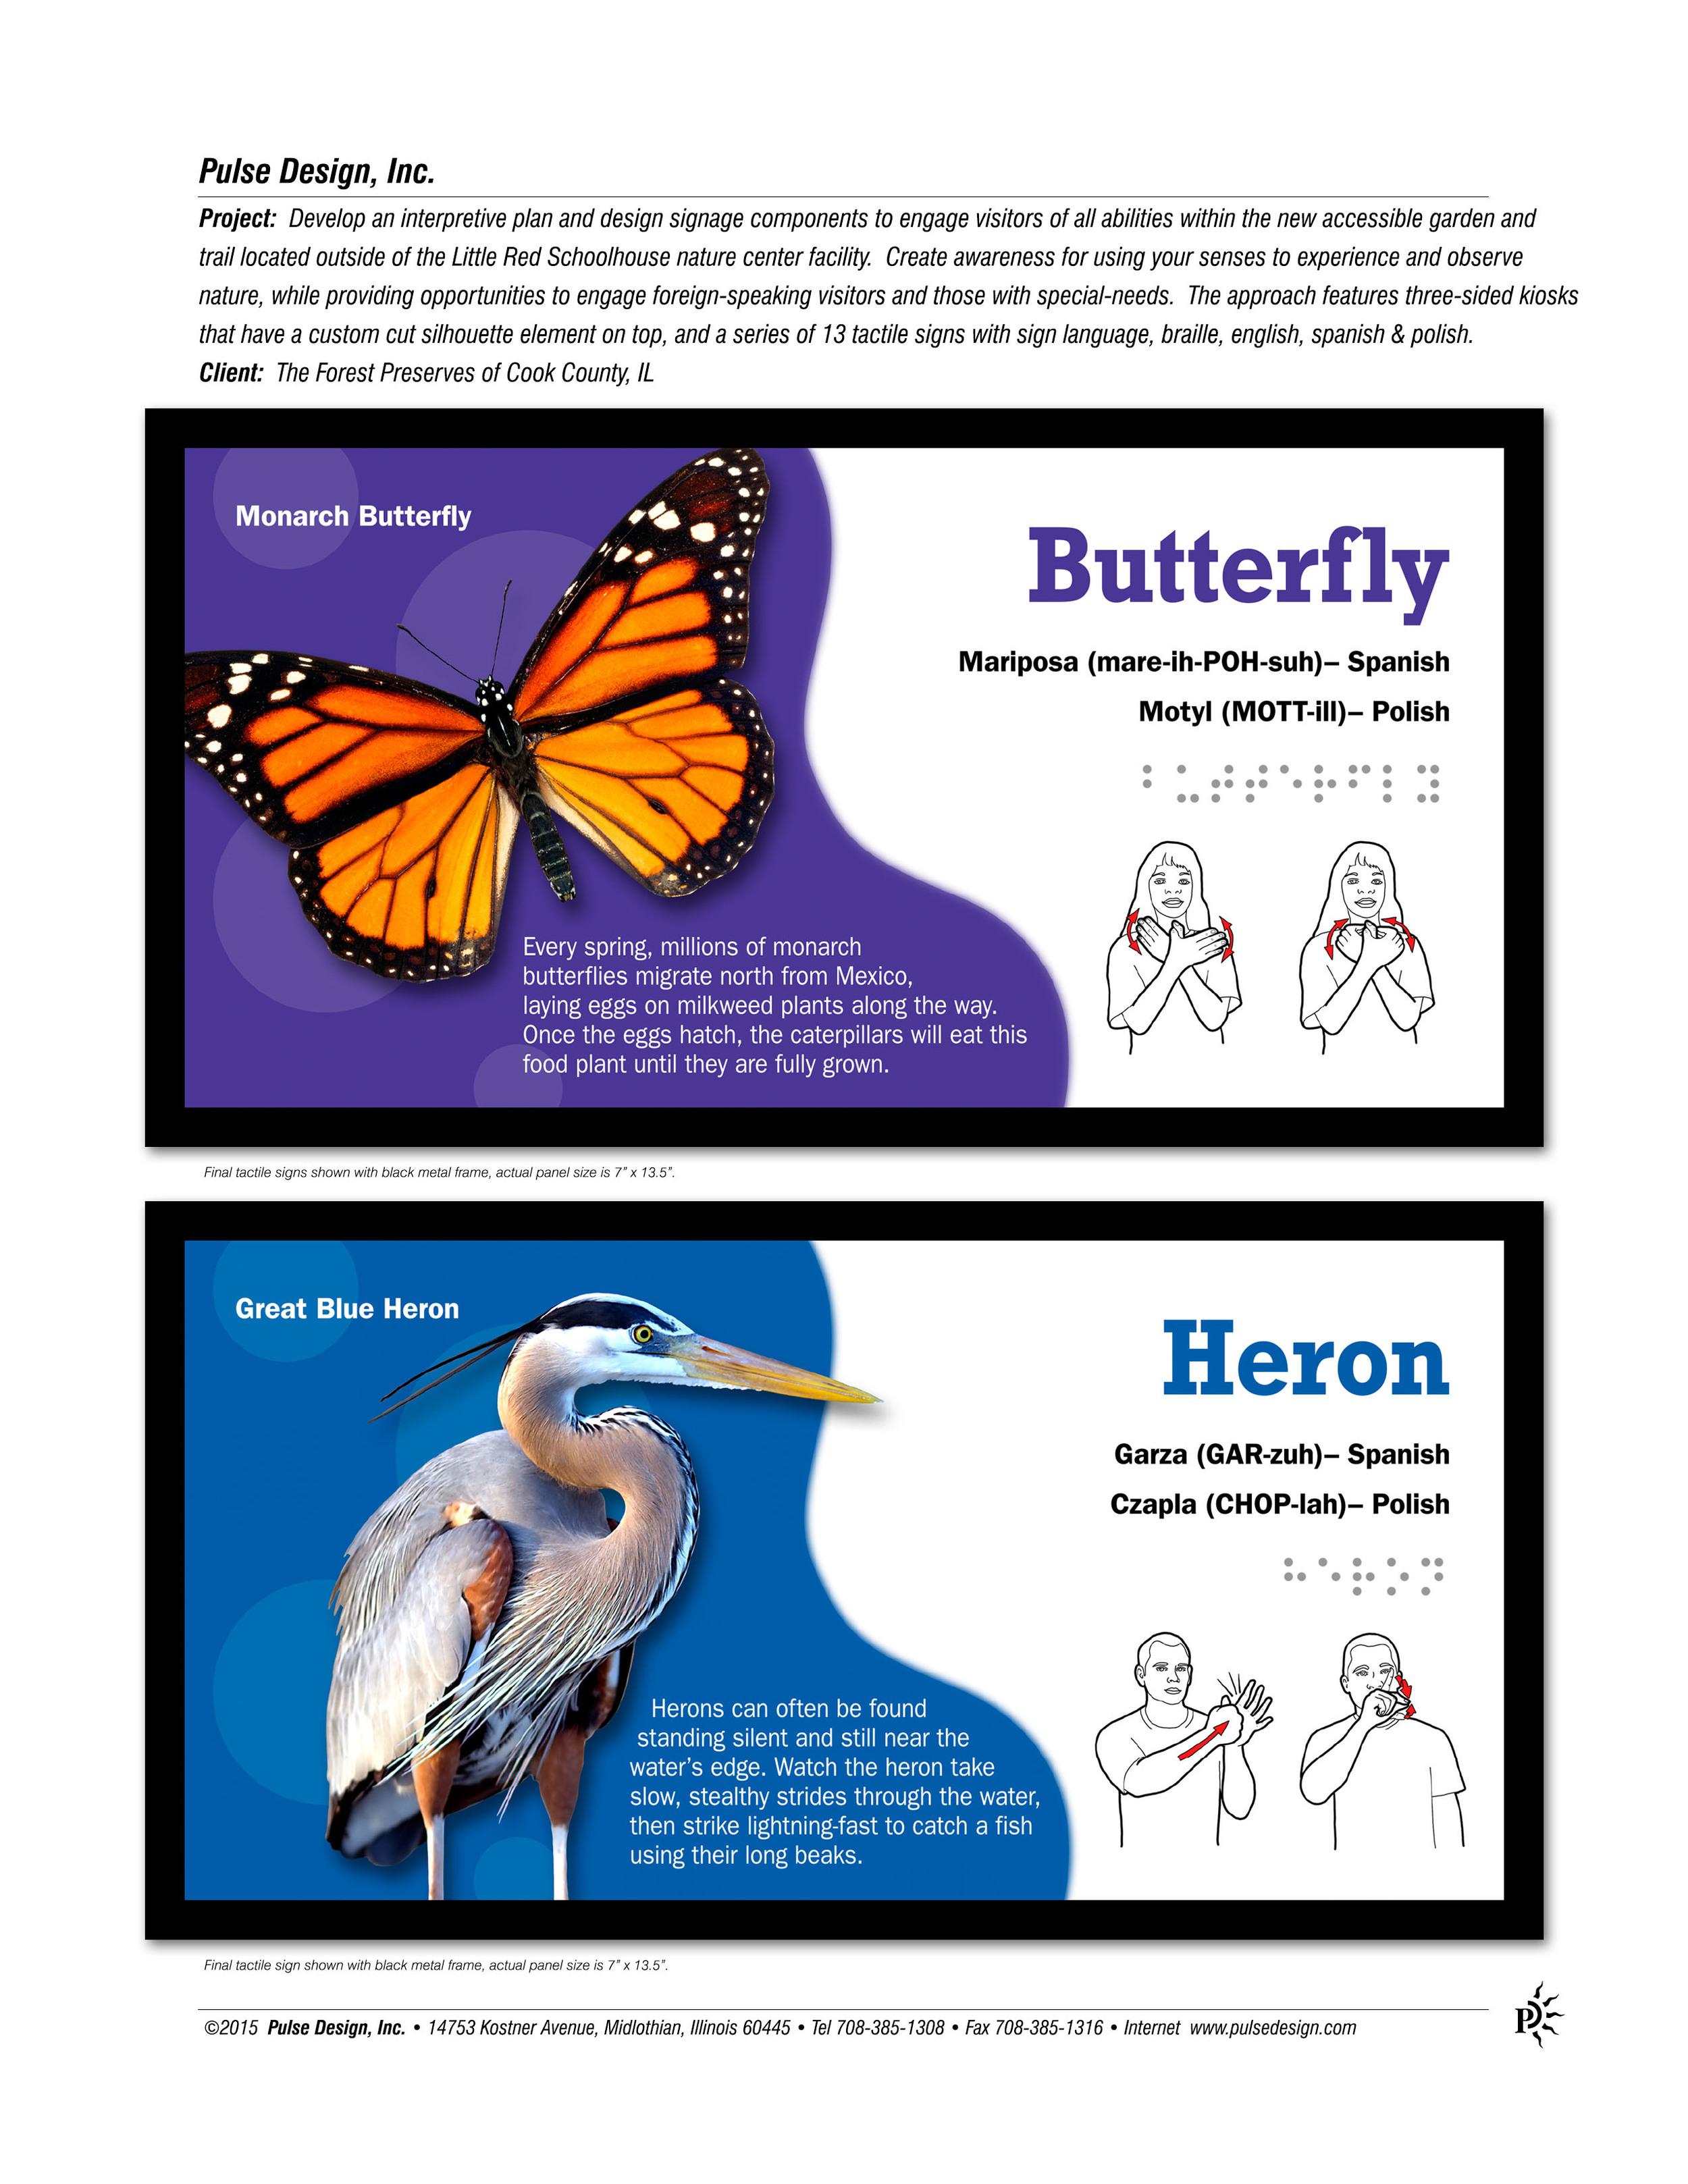 LittleRedSchoolhouse-Tactile-Trail-Signs-Lg-Pulse-Design-Inc.jpg